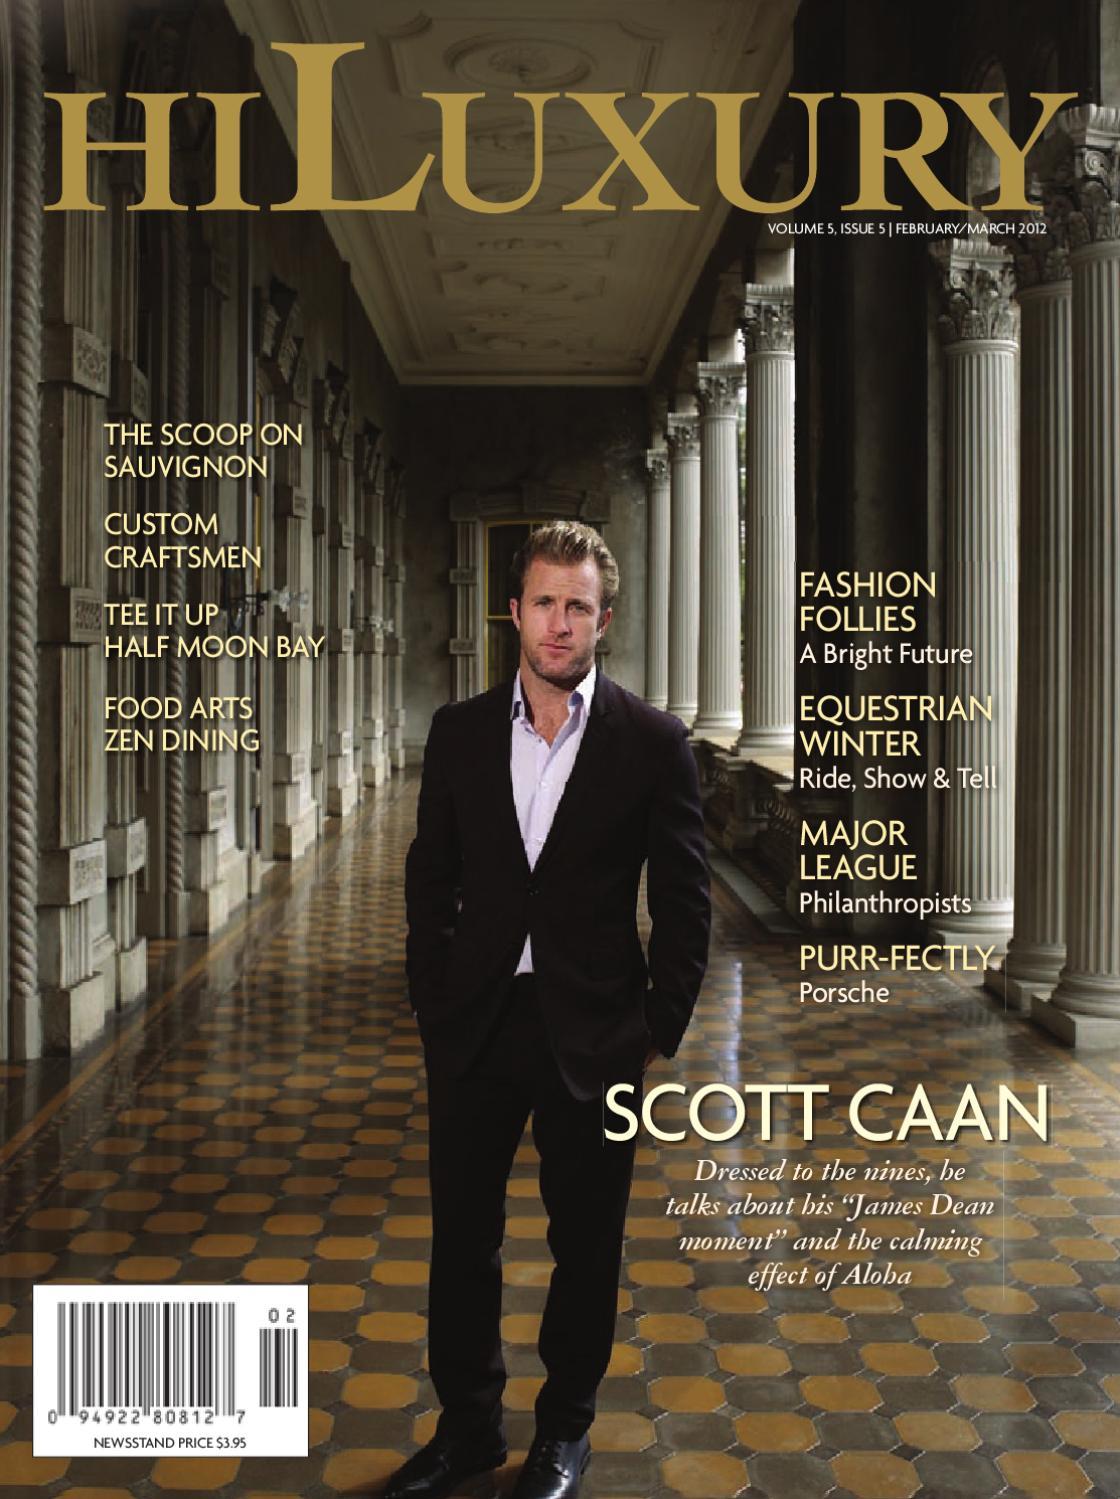 bd6288d28c4 HILuxury Magazine: February - March 2012 by Oahu Publications, Inc - issuu